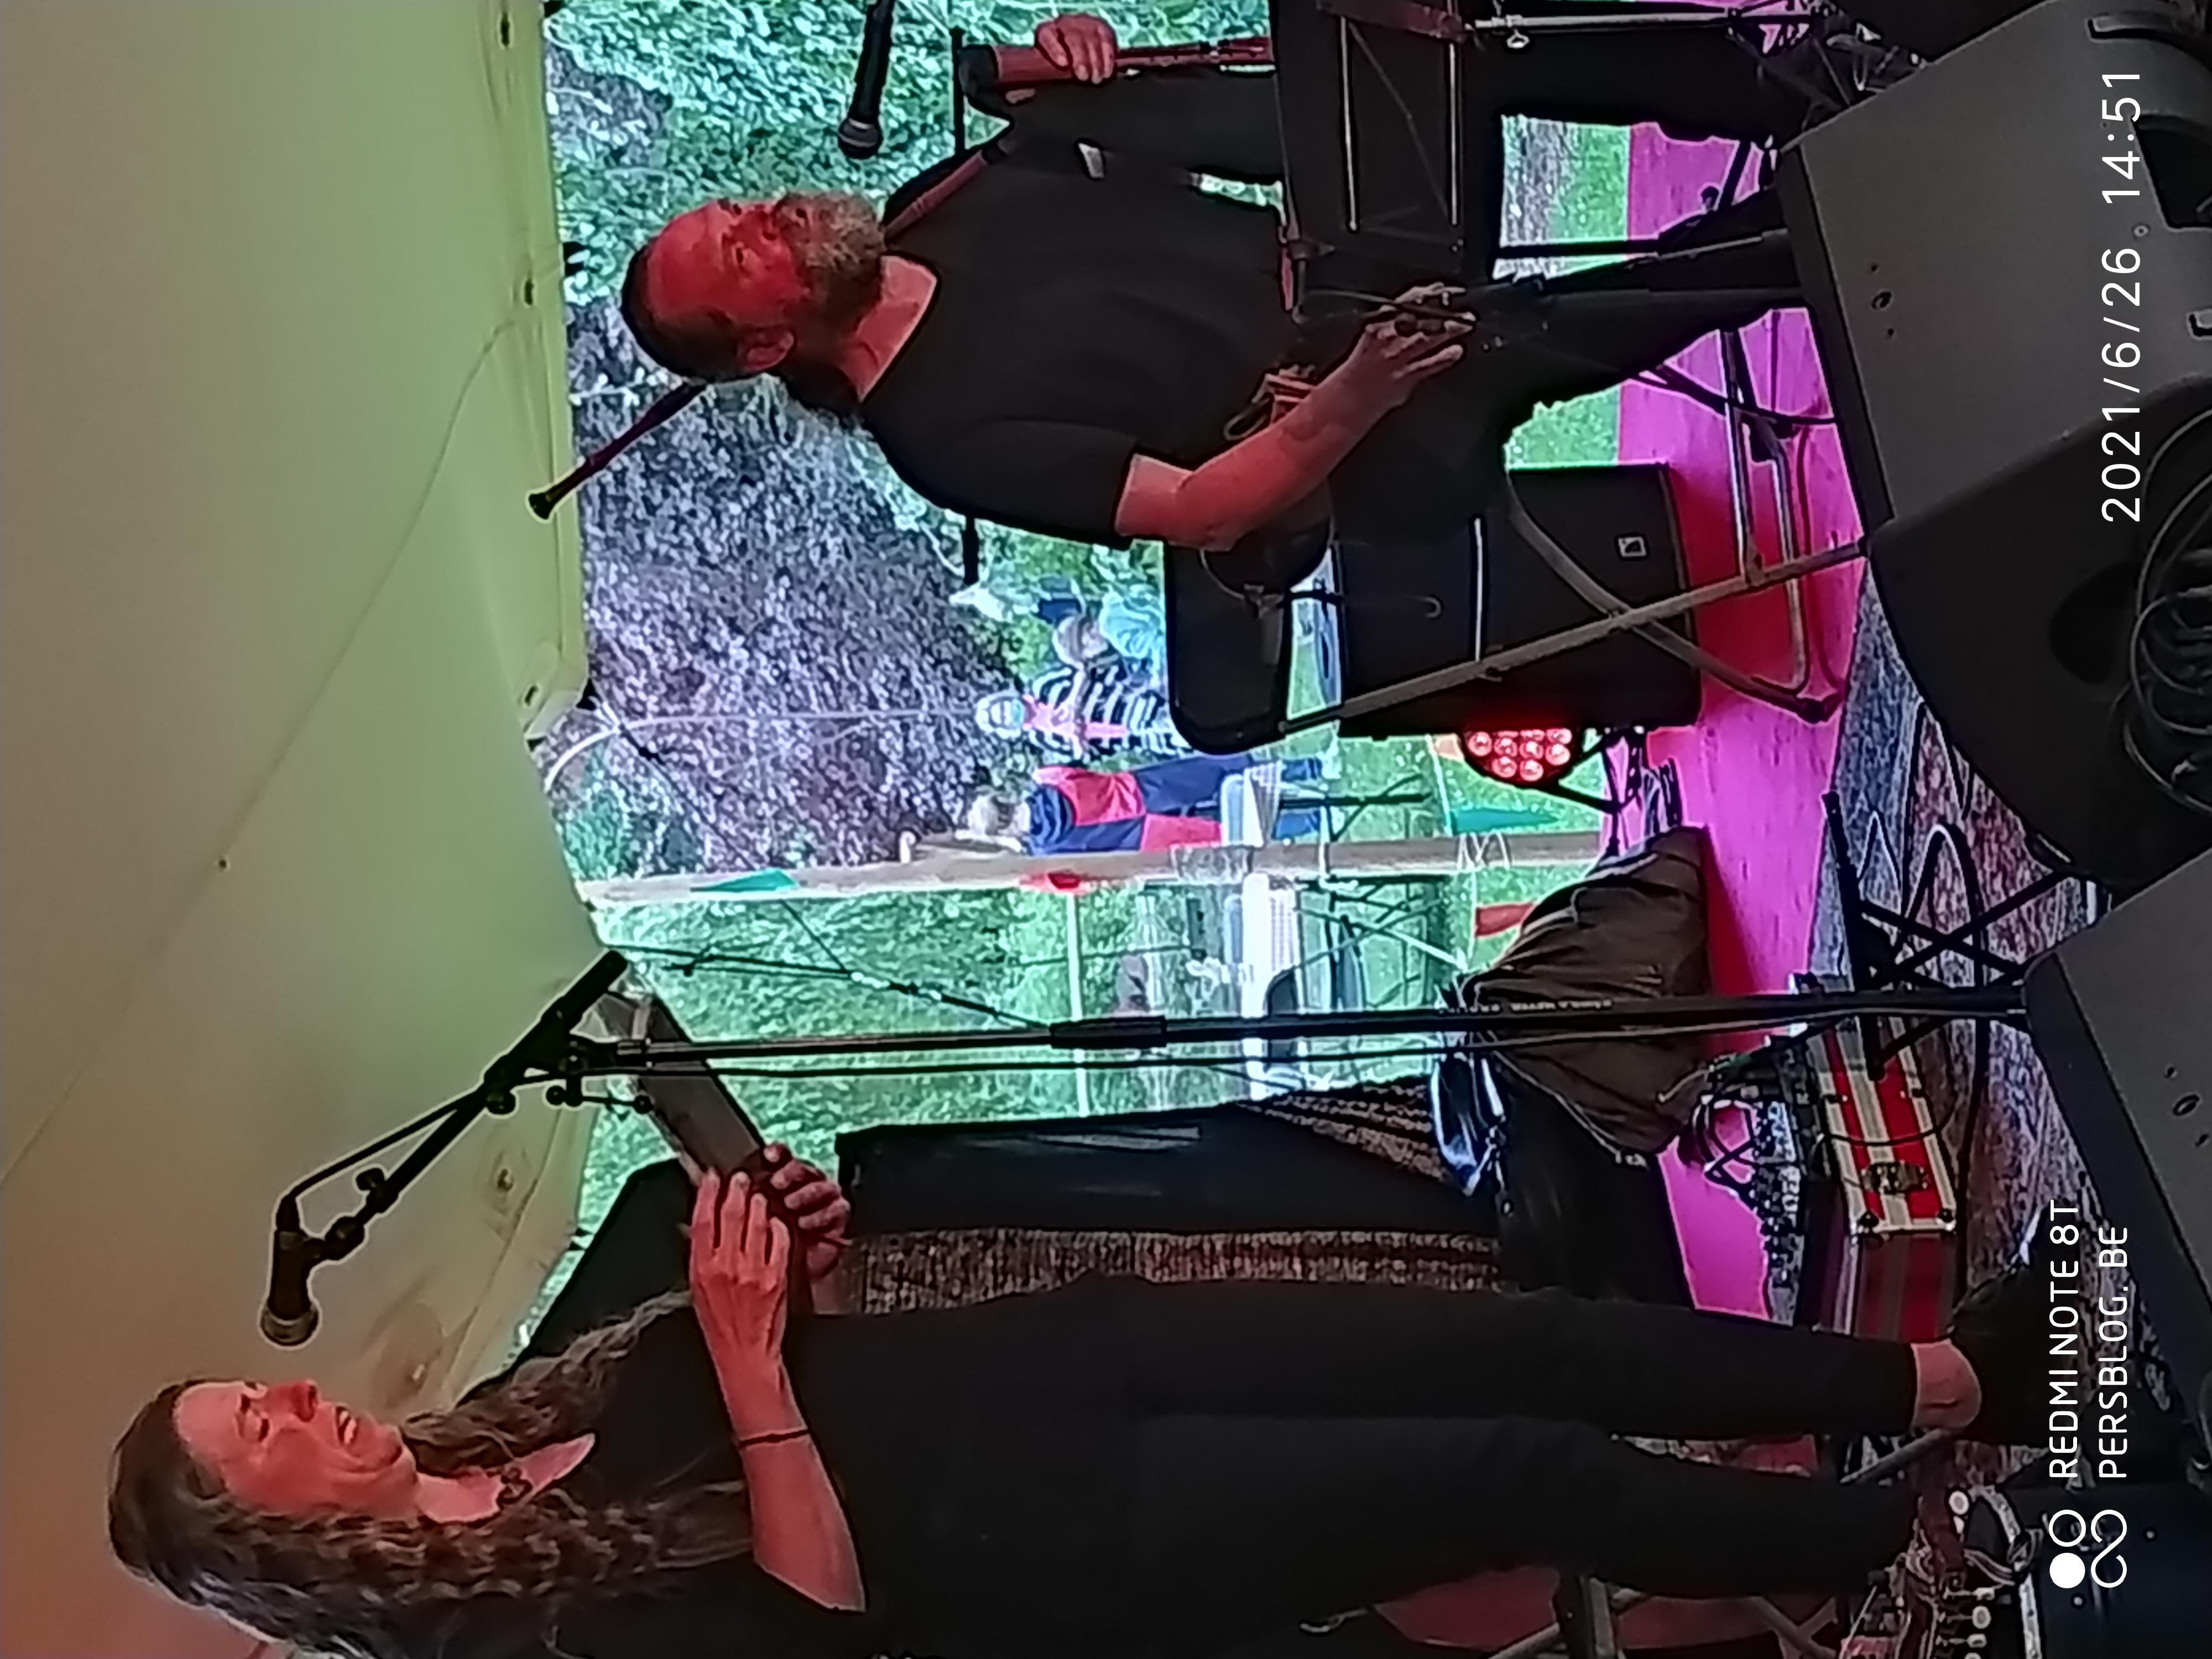 a Ferdinand Lousbergkaai - Ossenstraat - Koningin Astridpark - Middeleeuws spektakel IMG_20210626_145915 (16)